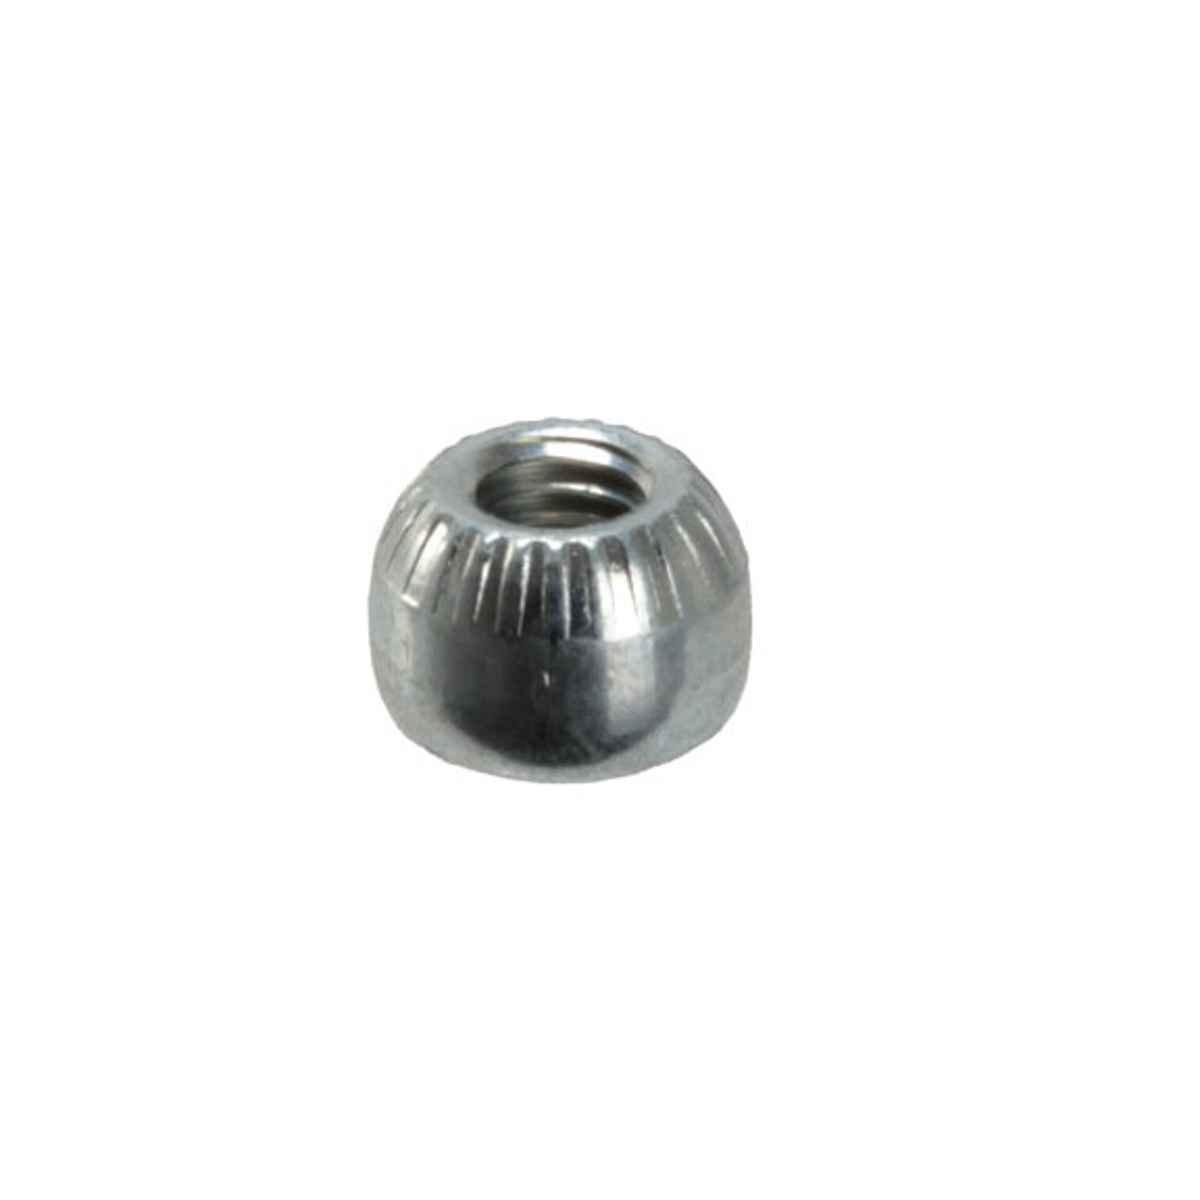 New KS LEV//DX//Int//272 Clamp Bolt Nut